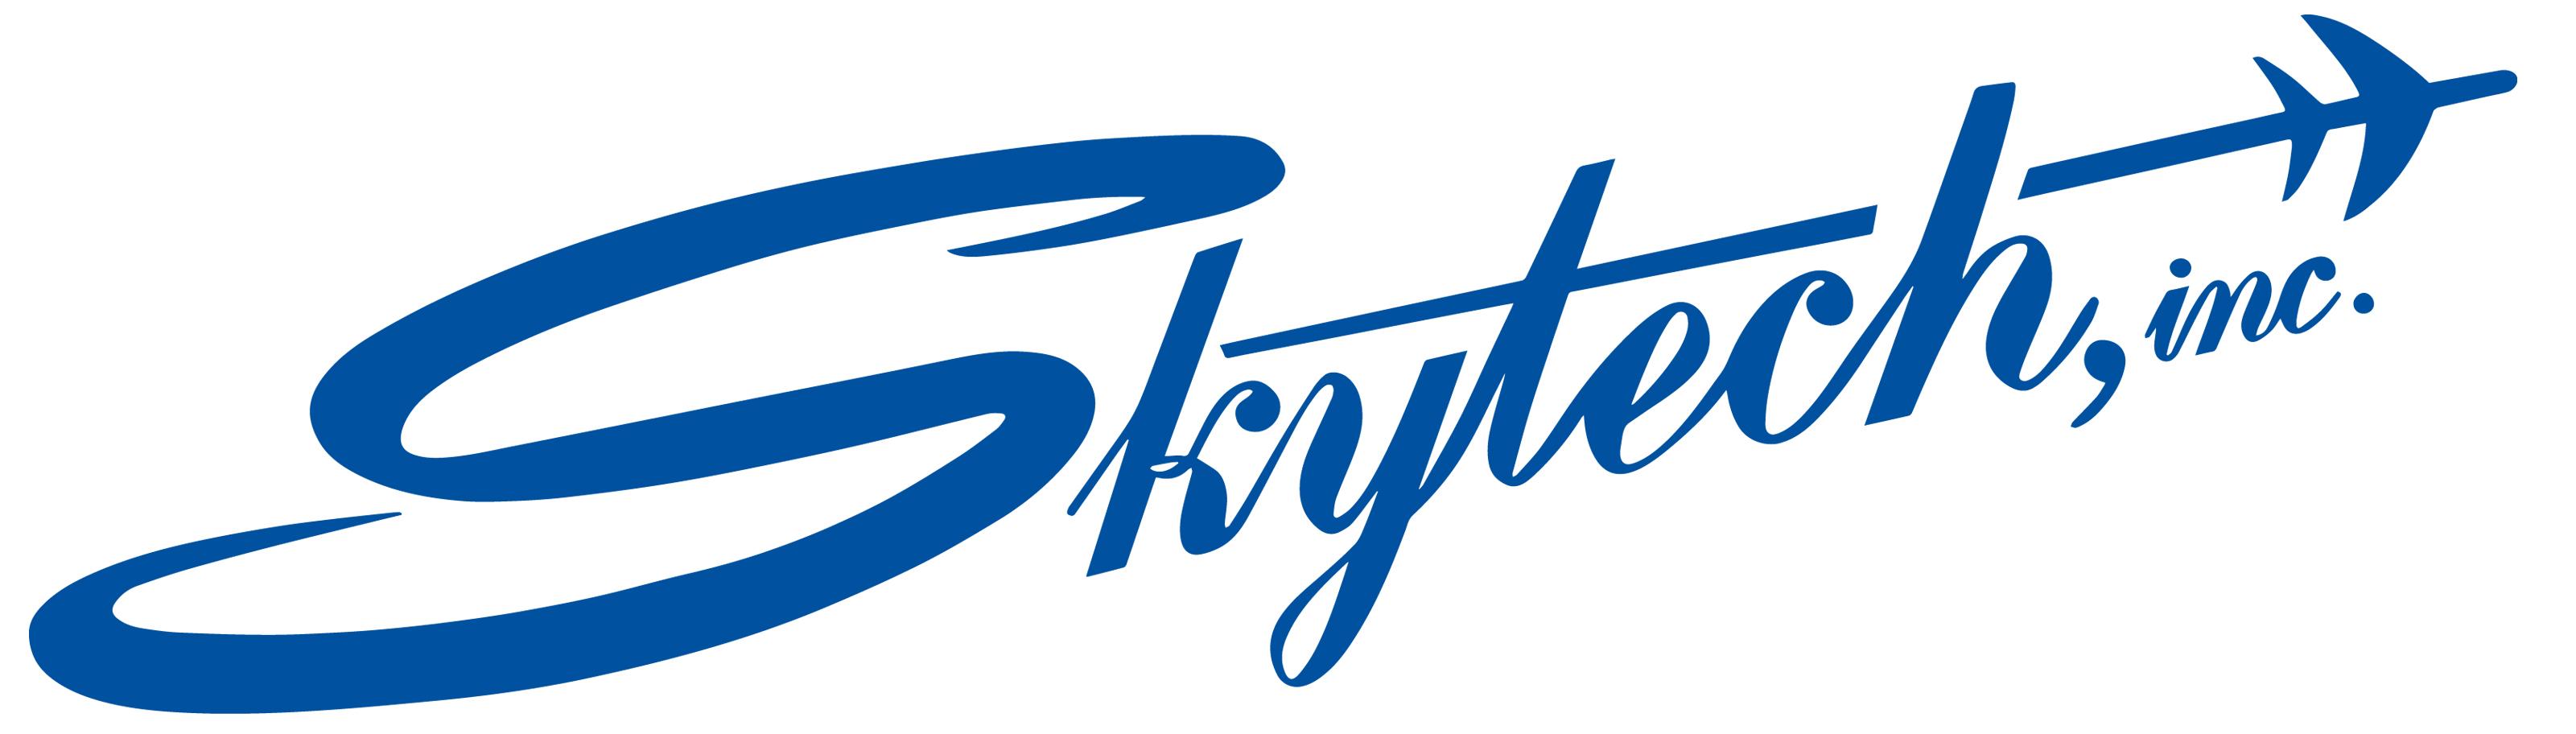 Skytech, Inc logo